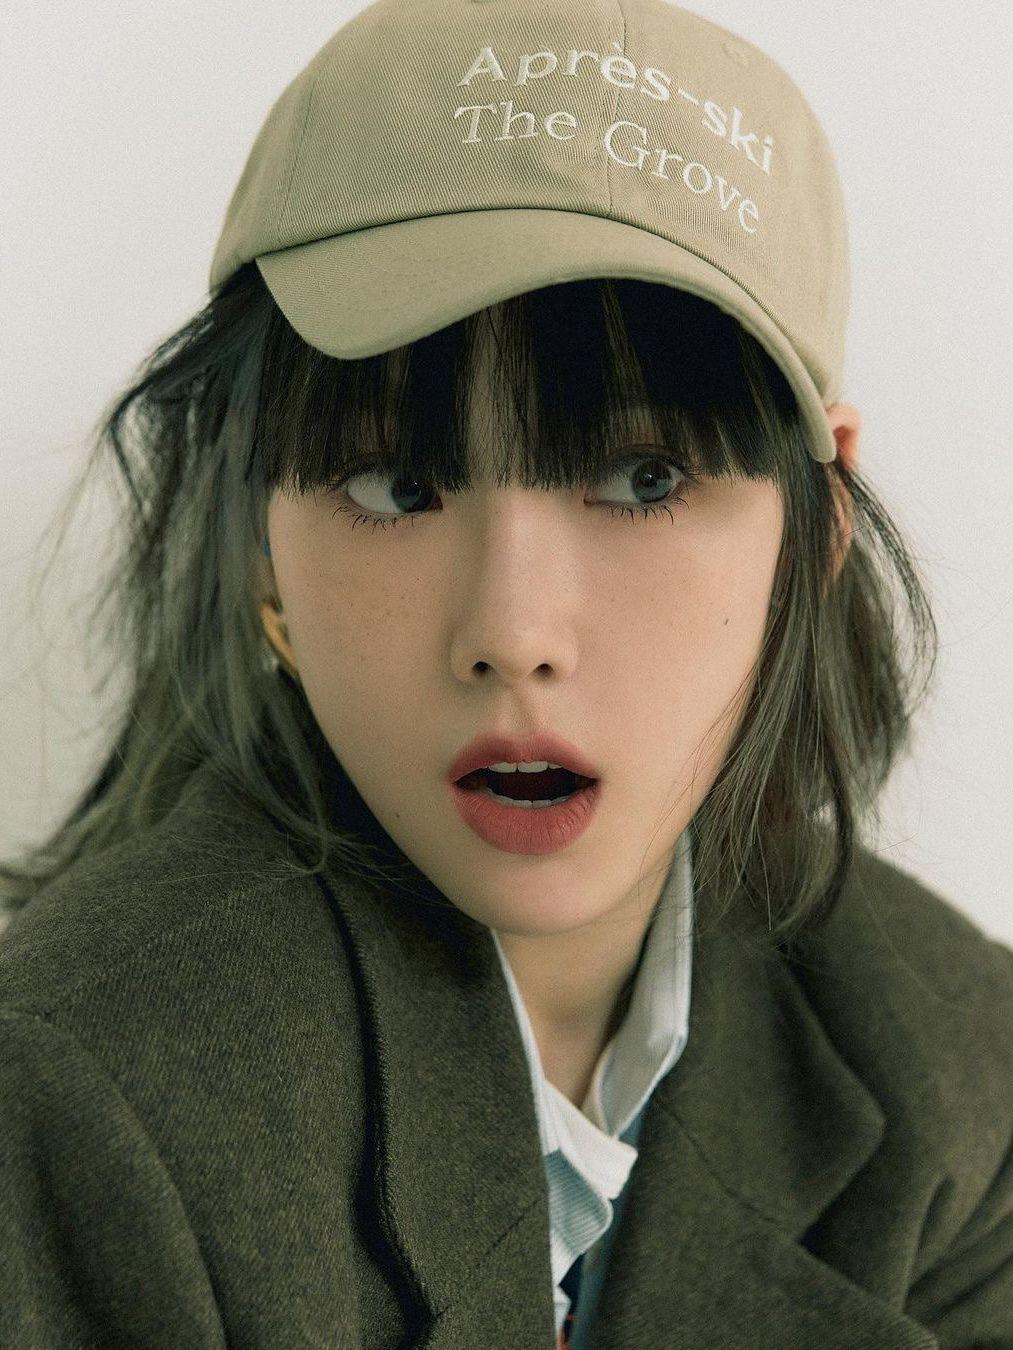 45 Korean Secret Two Tone Hair Color Ideas You Should Try In 2021 In 2021 Hair Color Korean Hairstyle Tone Hair